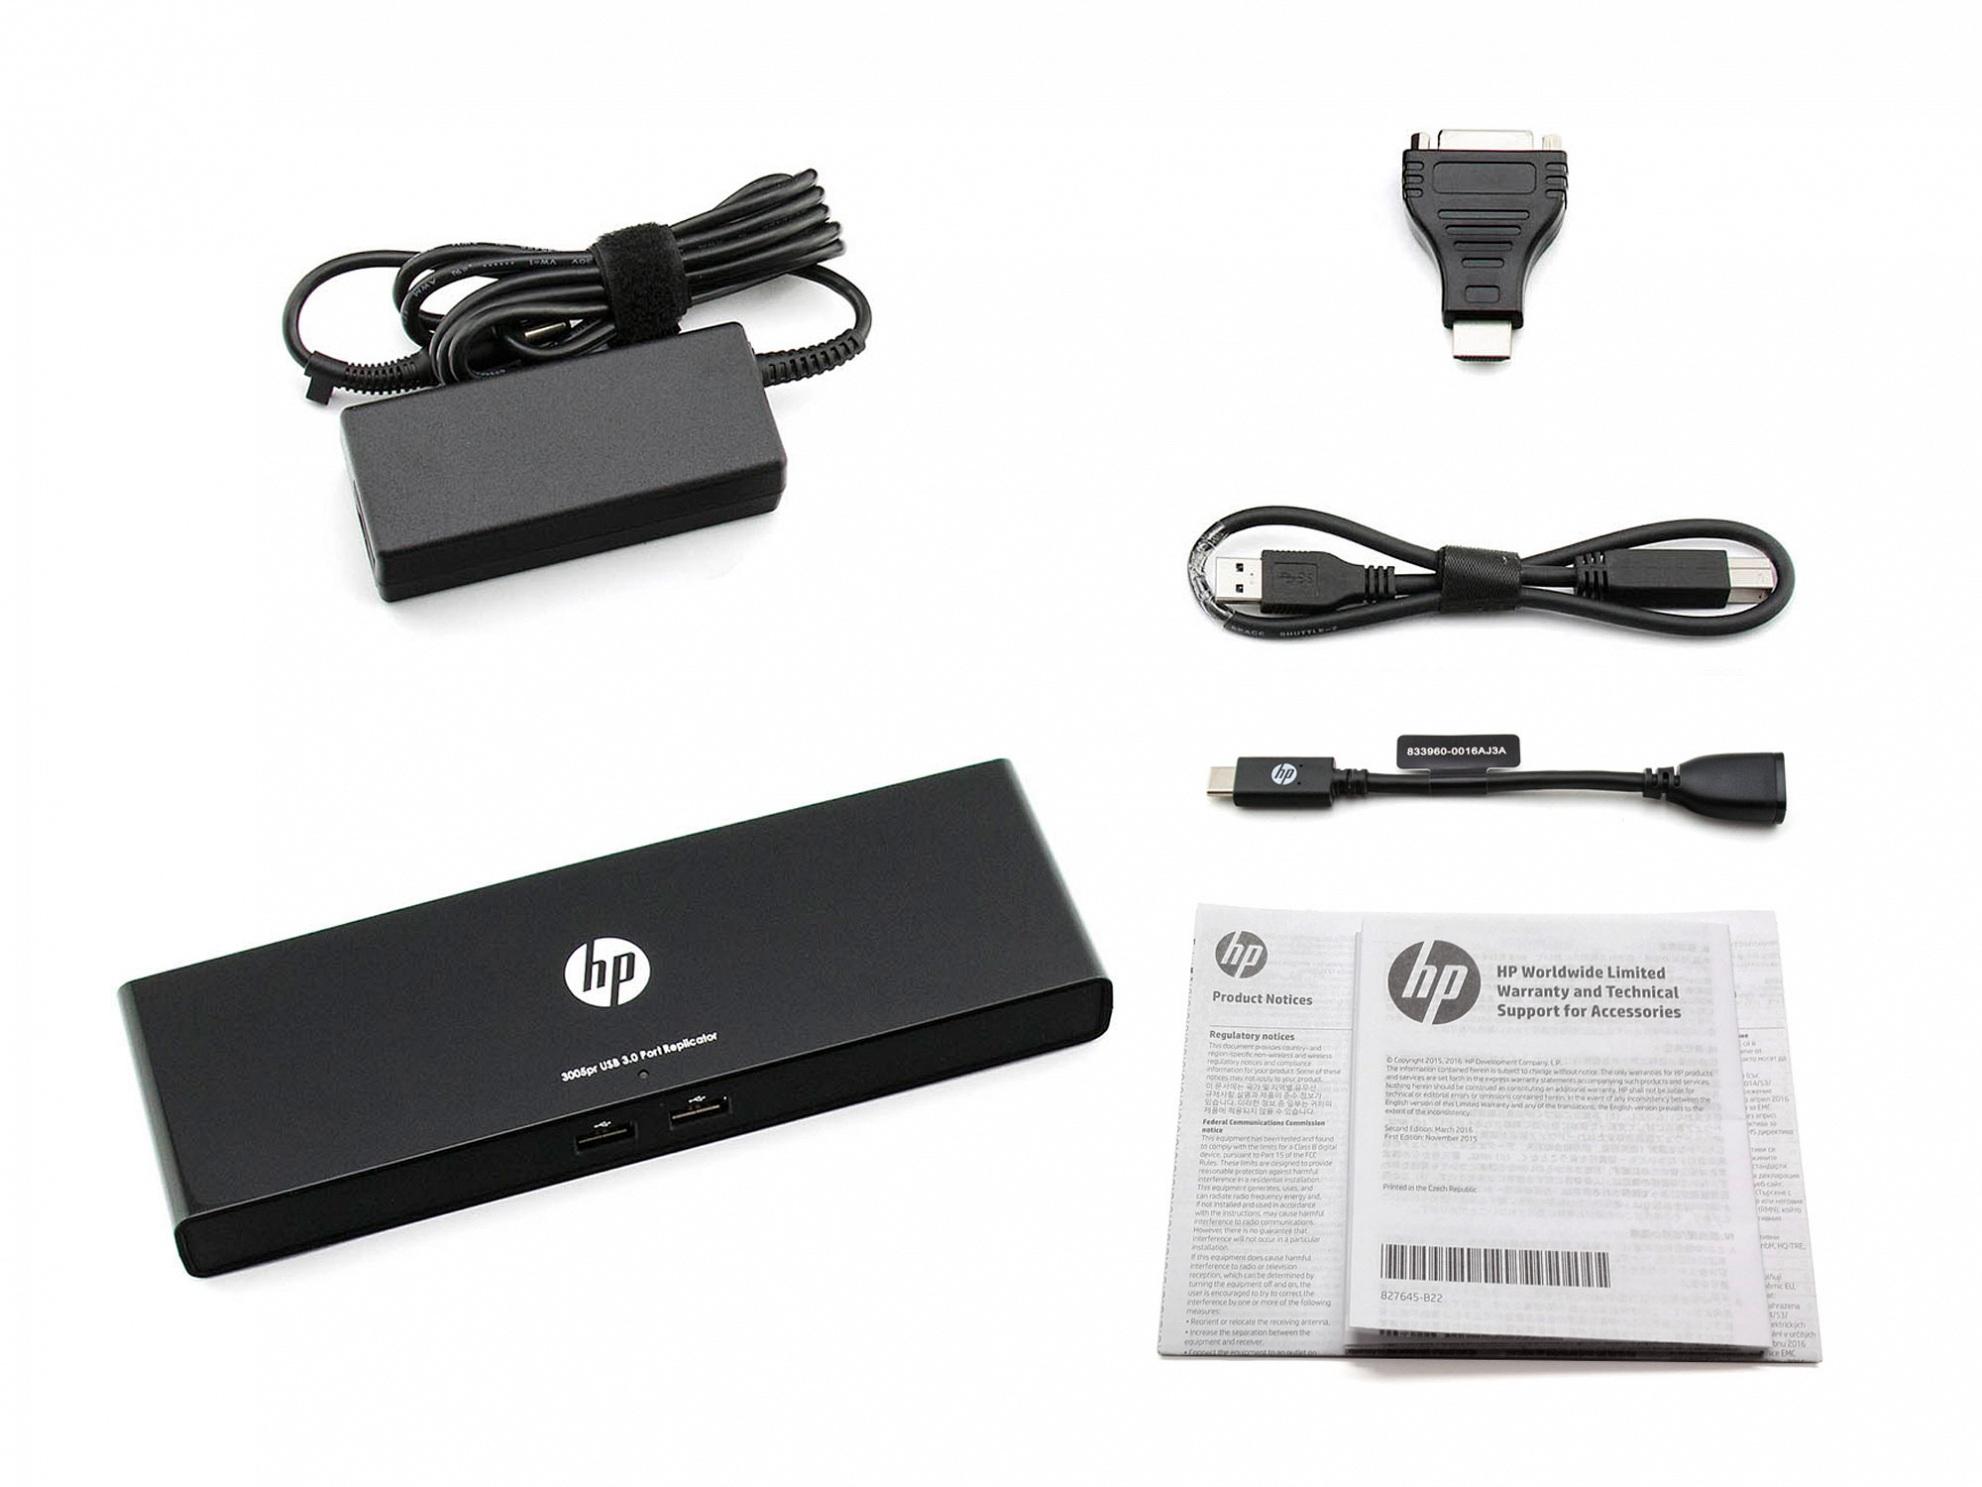 Universal Port Replikator HP 3005pr USB 3.0 für Fujitsu Amilo Li-3910 Reg.No. EF9